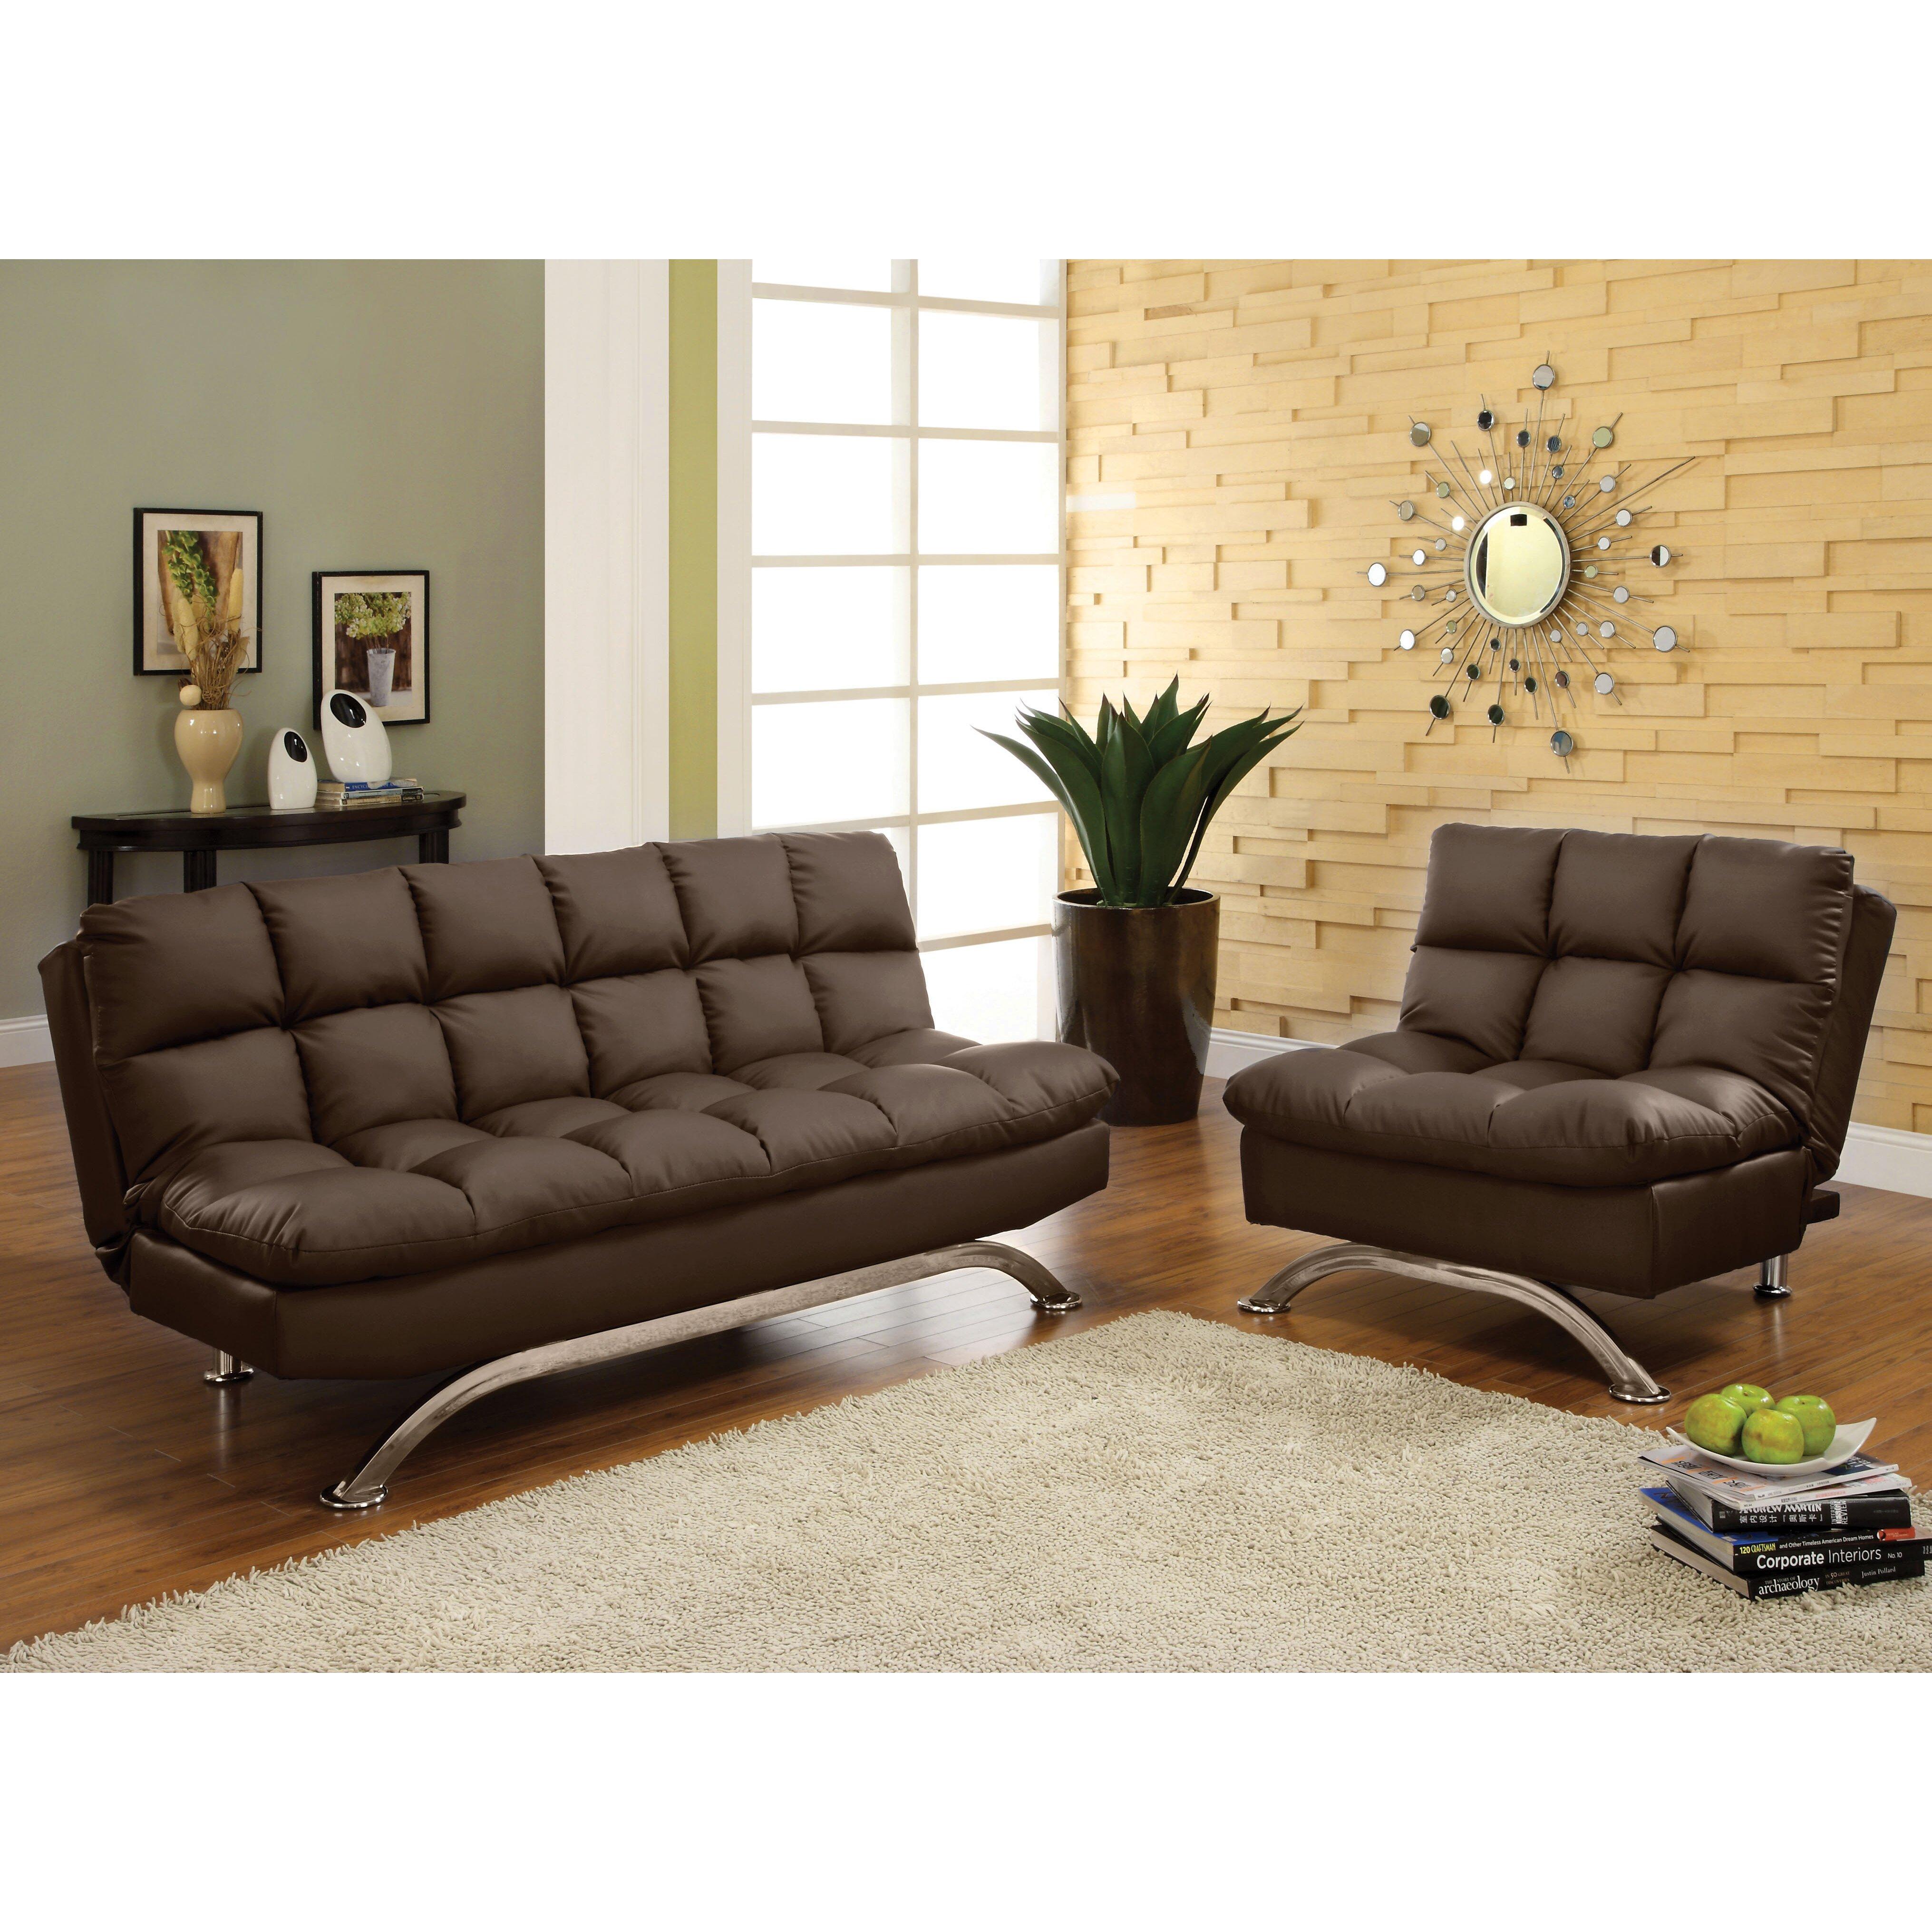 Hokku designs aristo sleeper sofa reviews wayfair for Hokku designs living room furniture